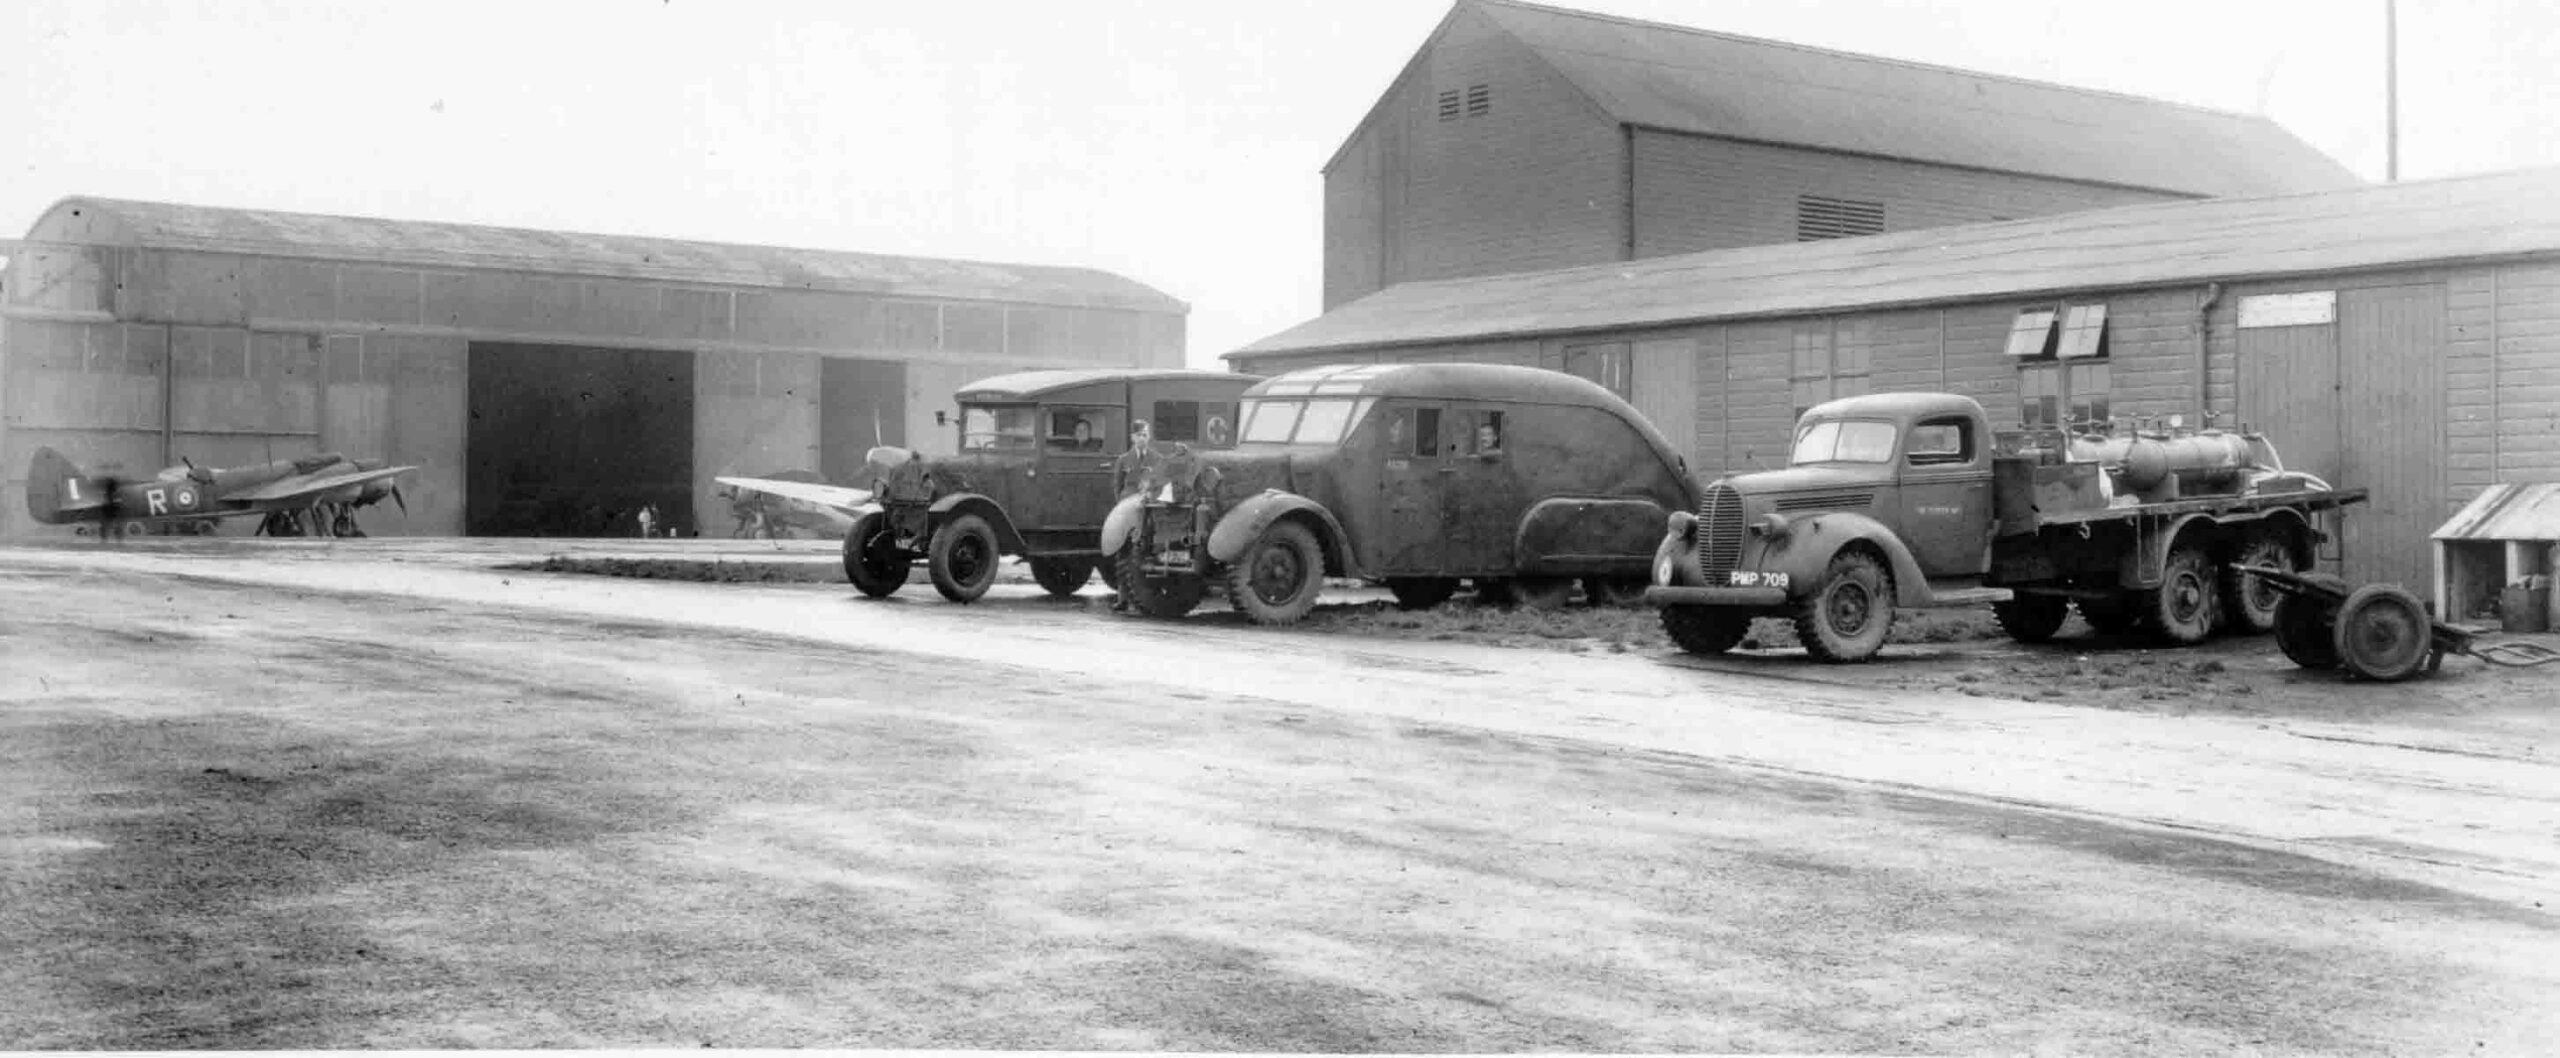 PC71/19/1129 Fire tenders parked outside a hut, RAF Aldergrove, 1941